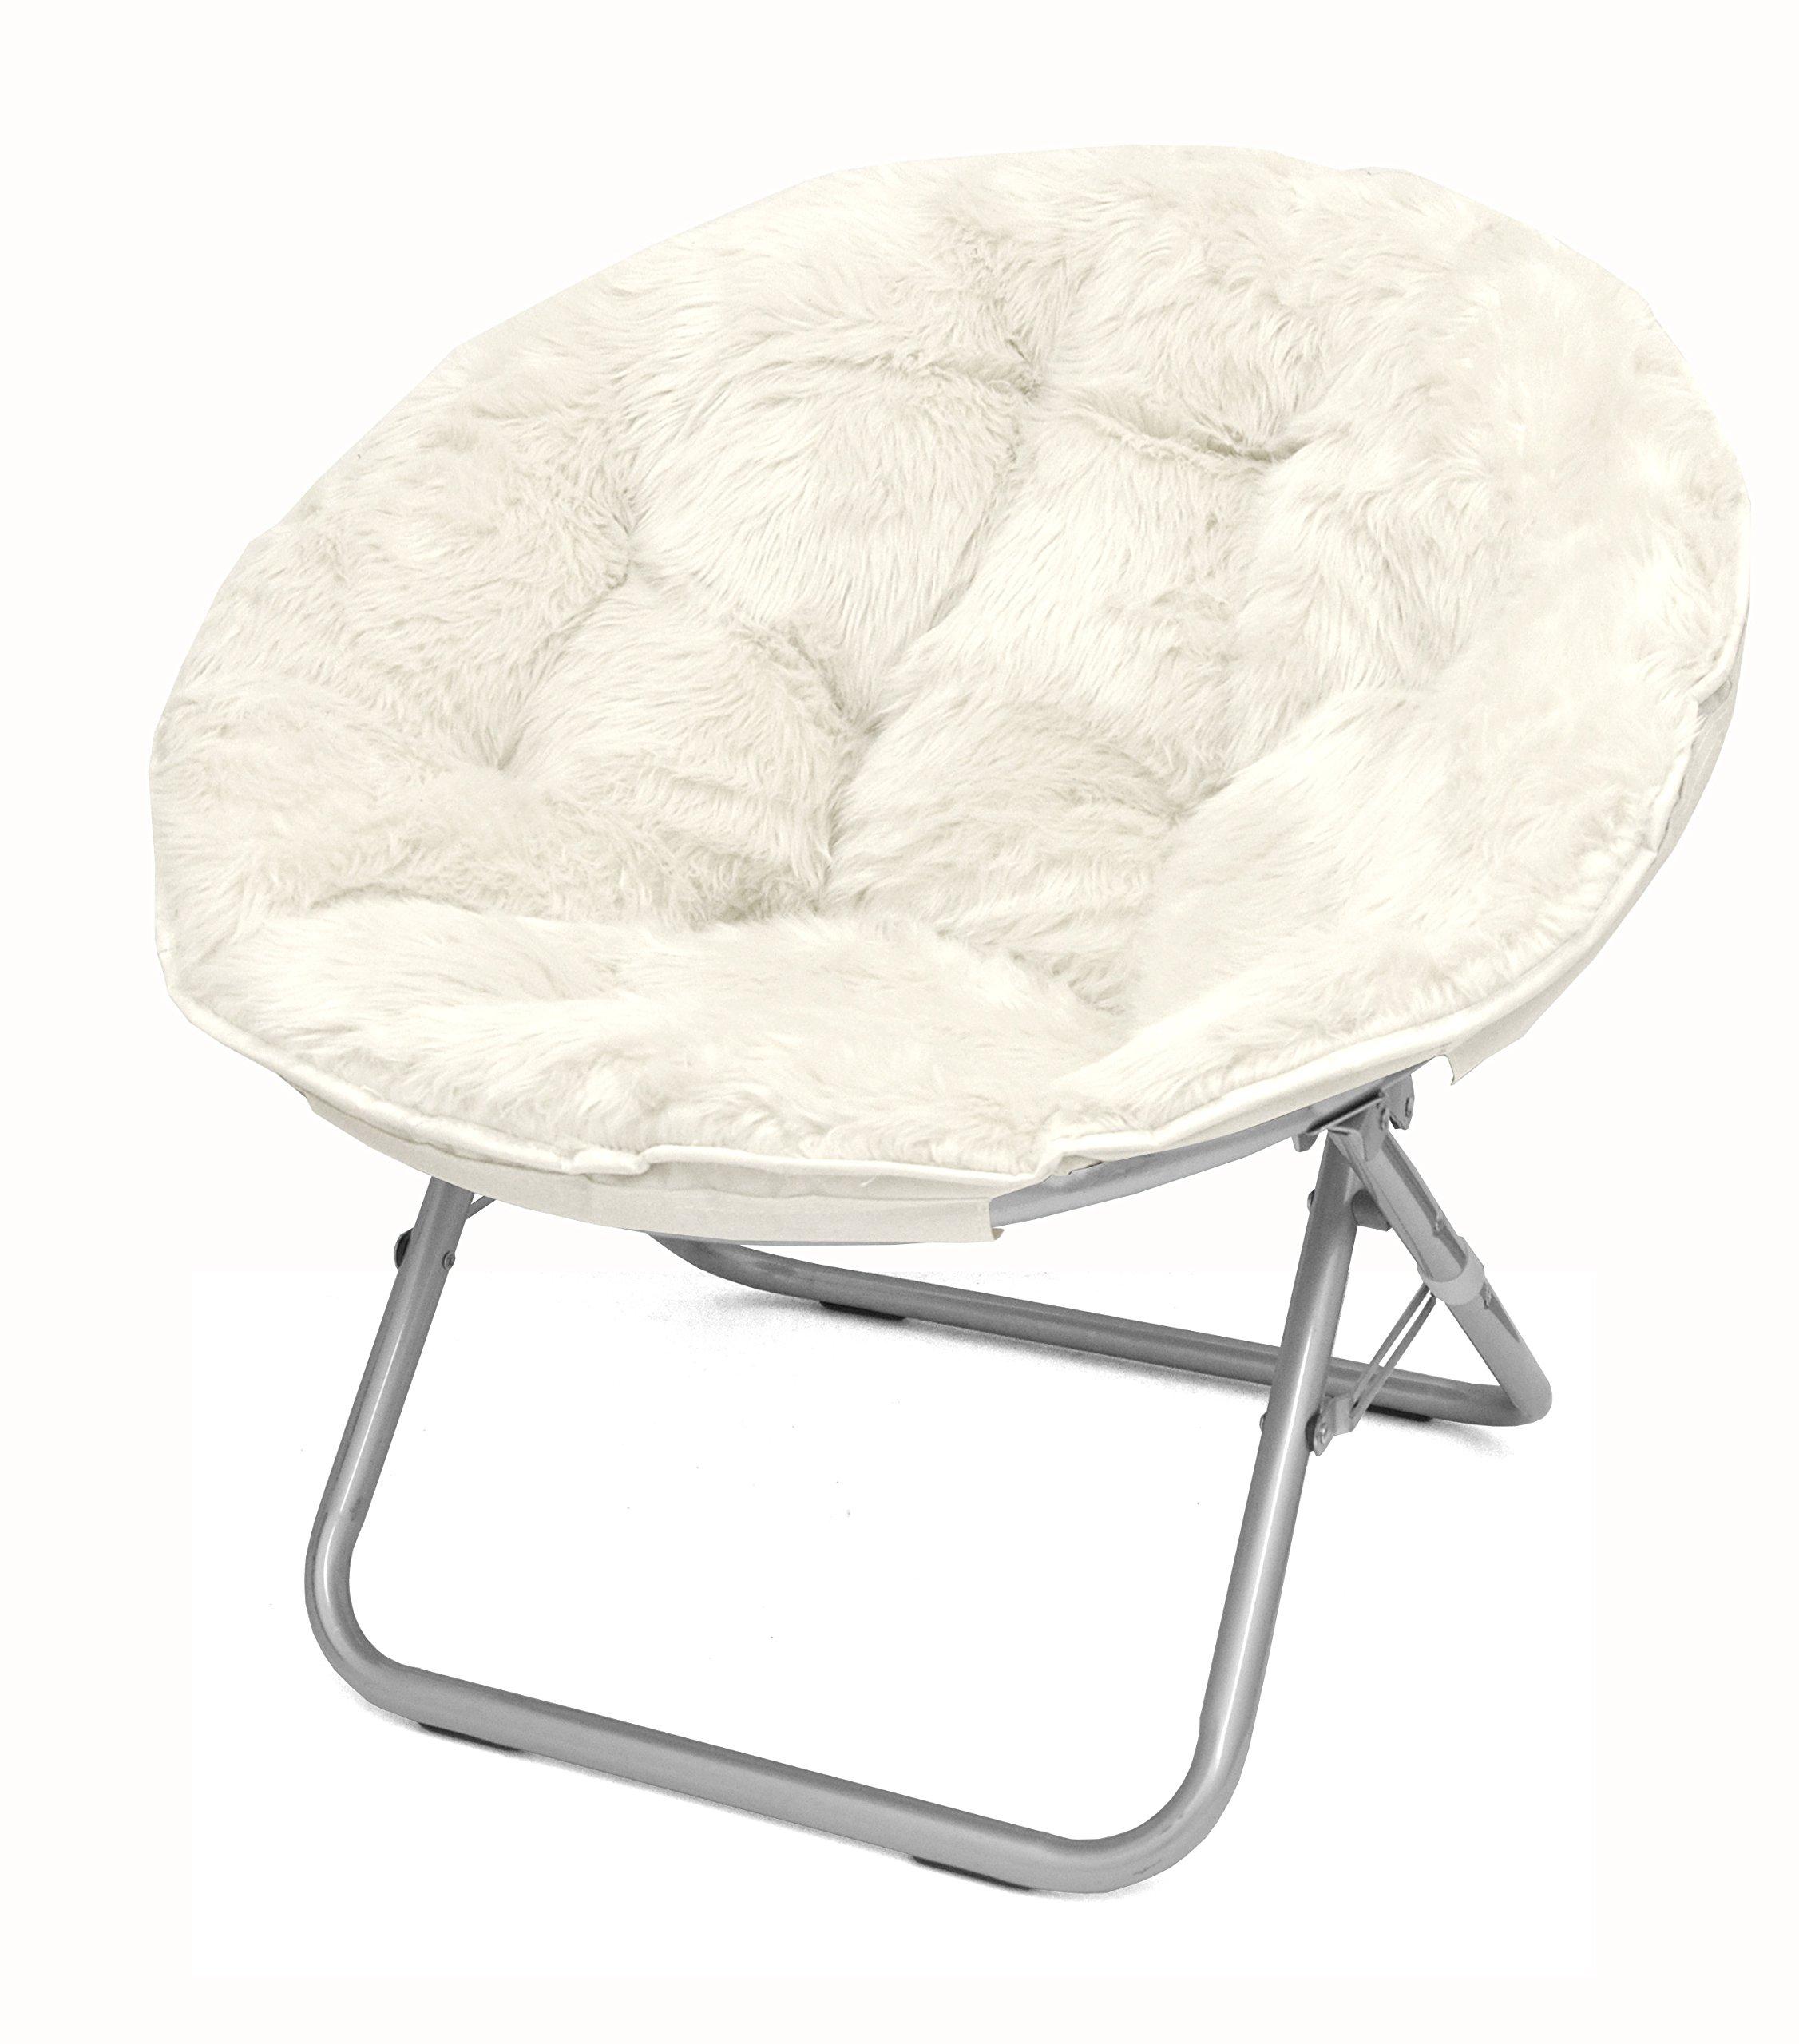 Urban Shop Mongolian Faux Fur Saucer Chair by Urban Shop